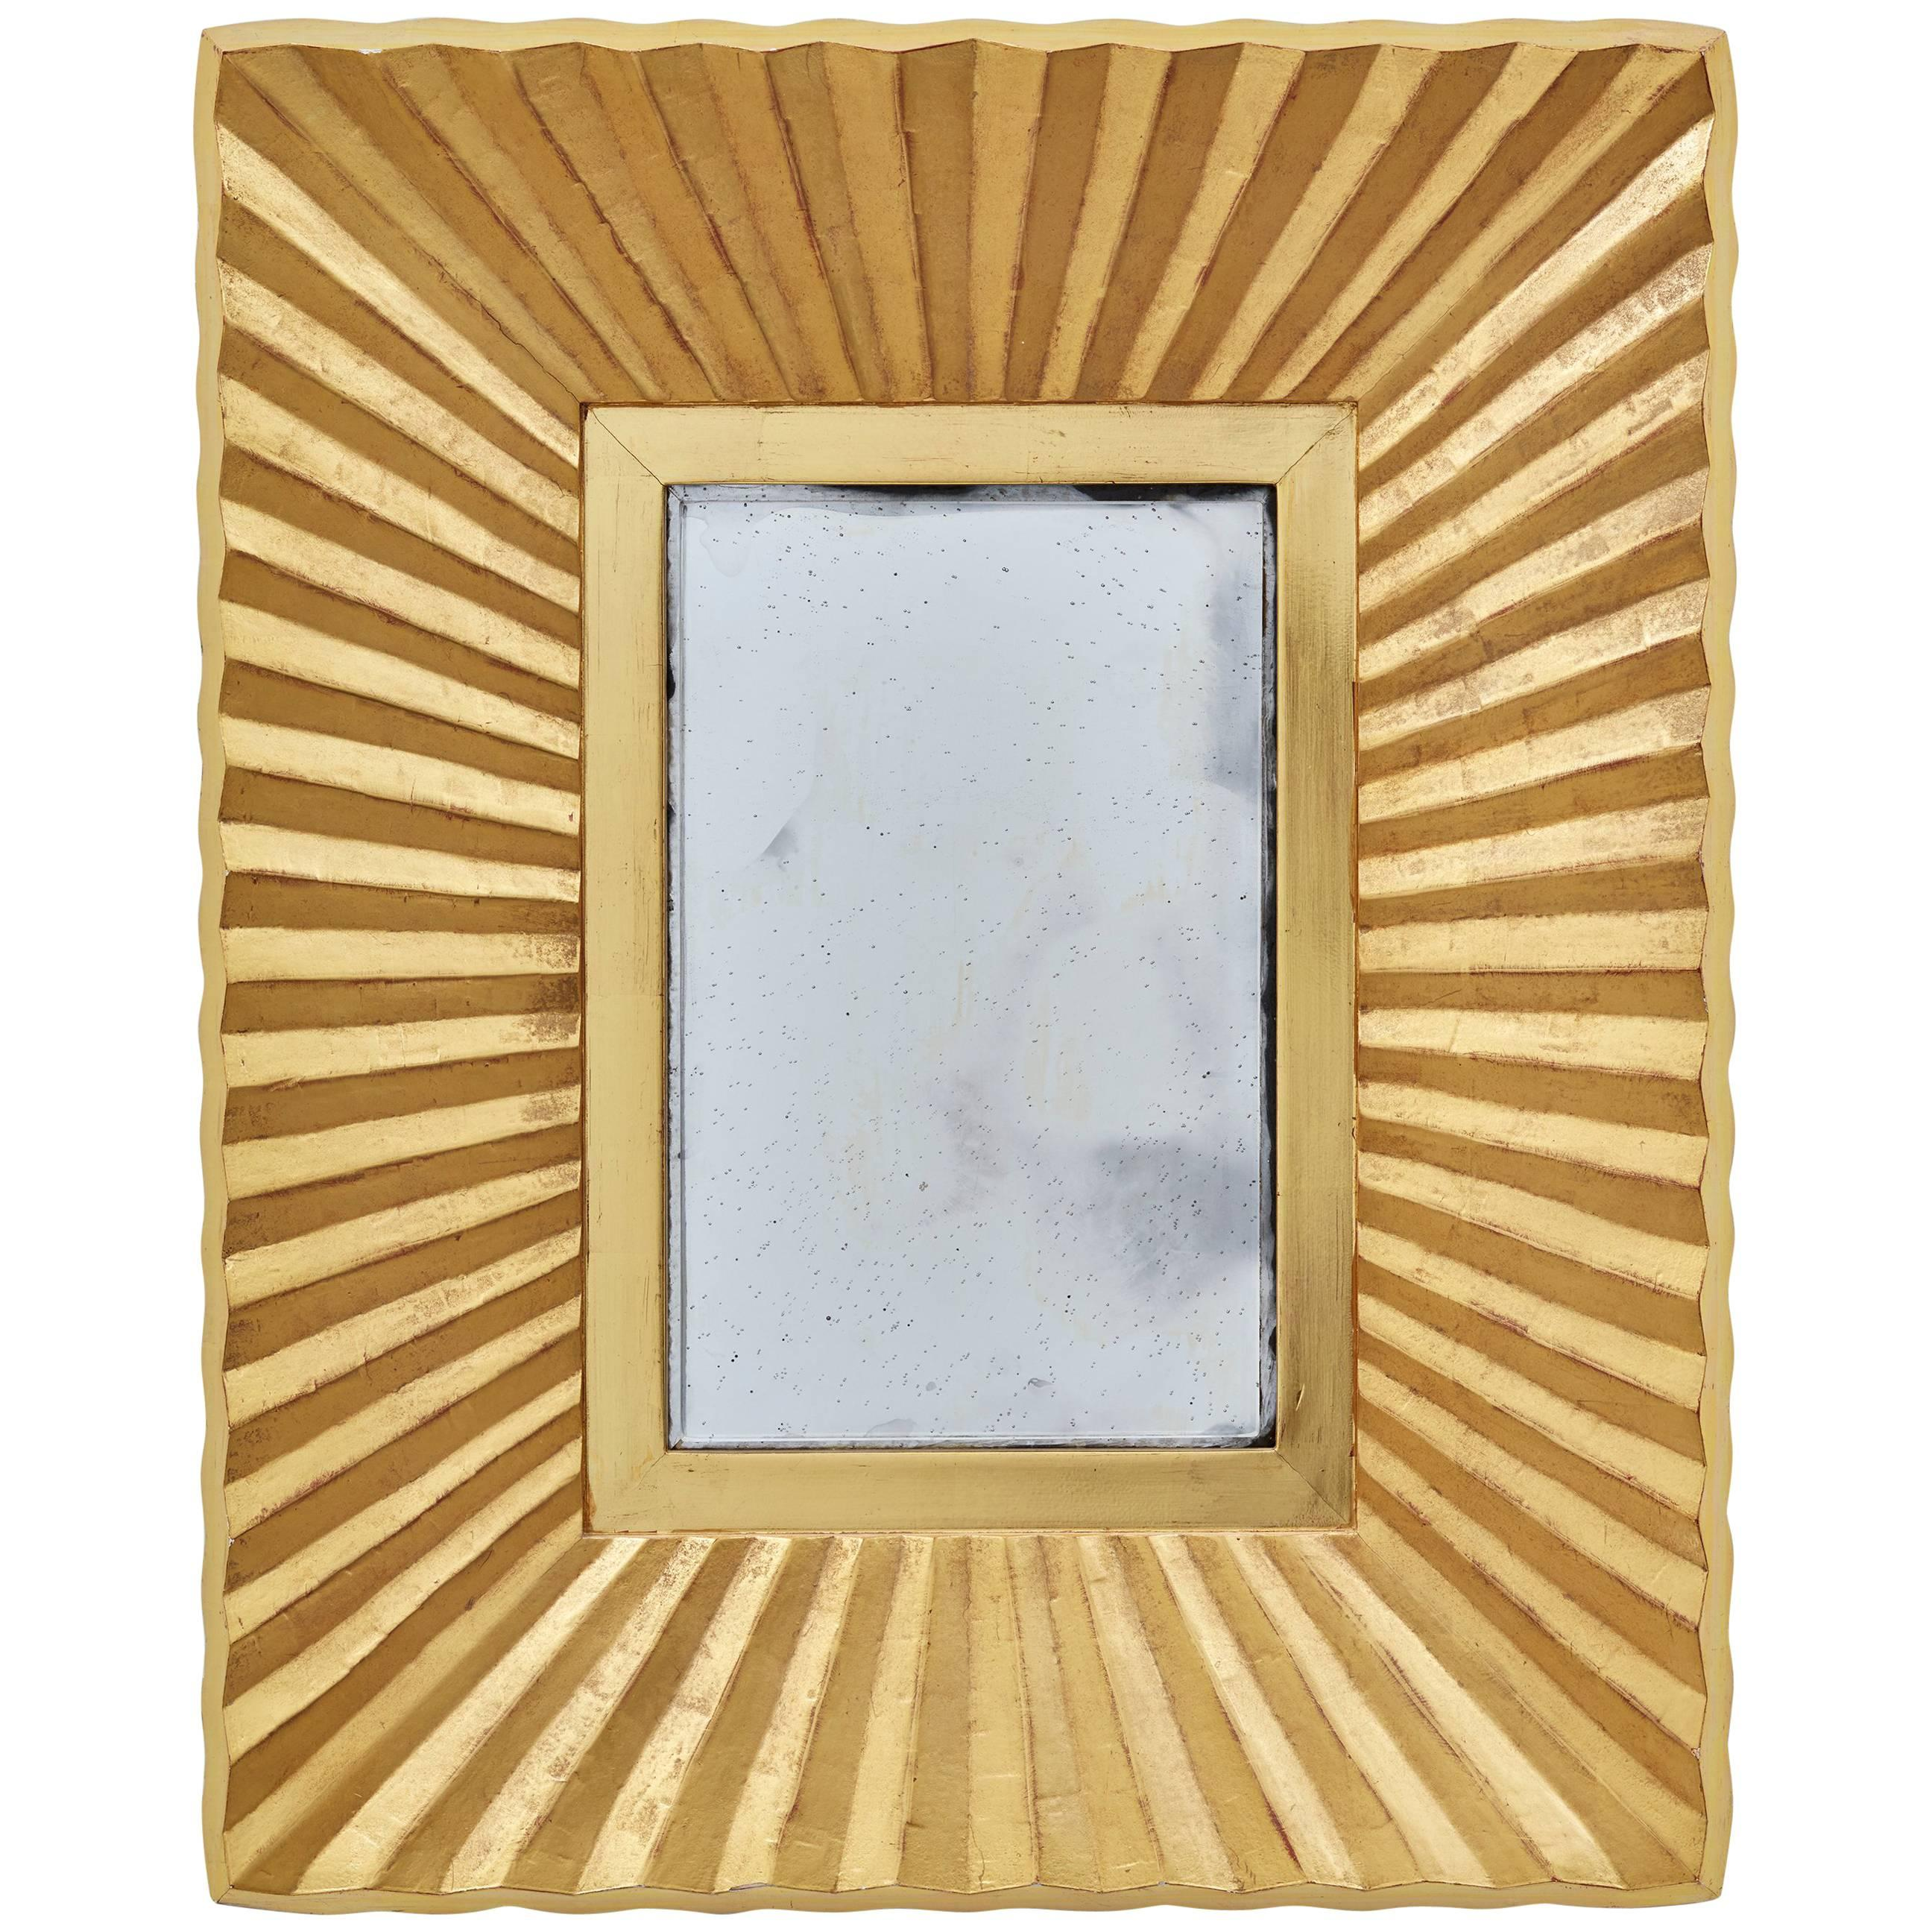 Bark Frameworks 23Karat Gold Pleated Wall Mirror Designed by Jared